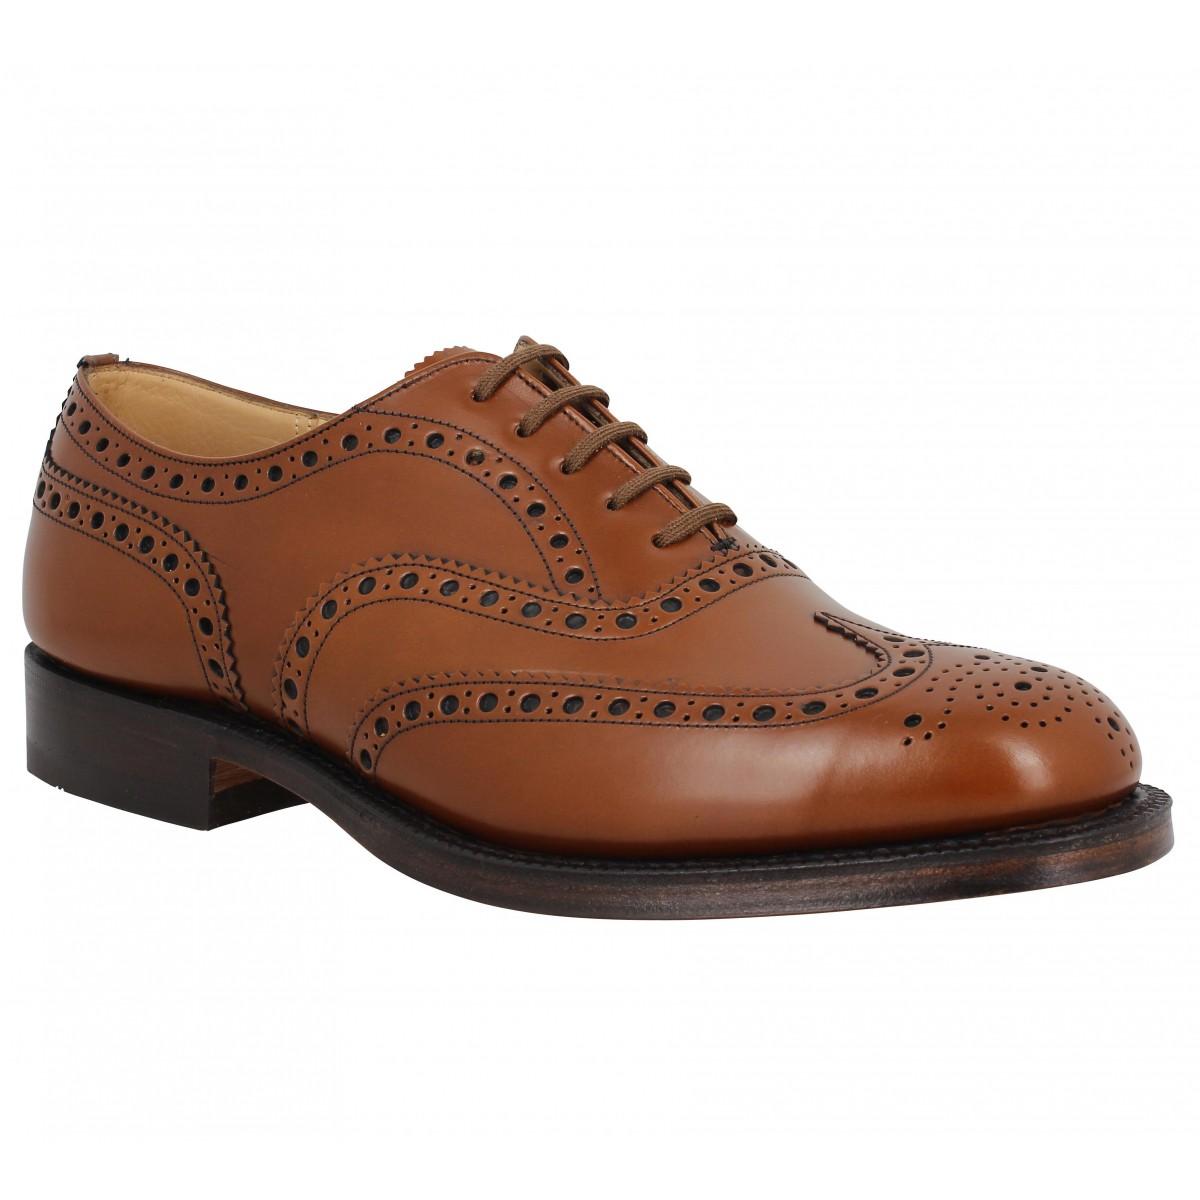 Chaussures - Bas-tops Et Baskets Churchs F0l7OLRO1